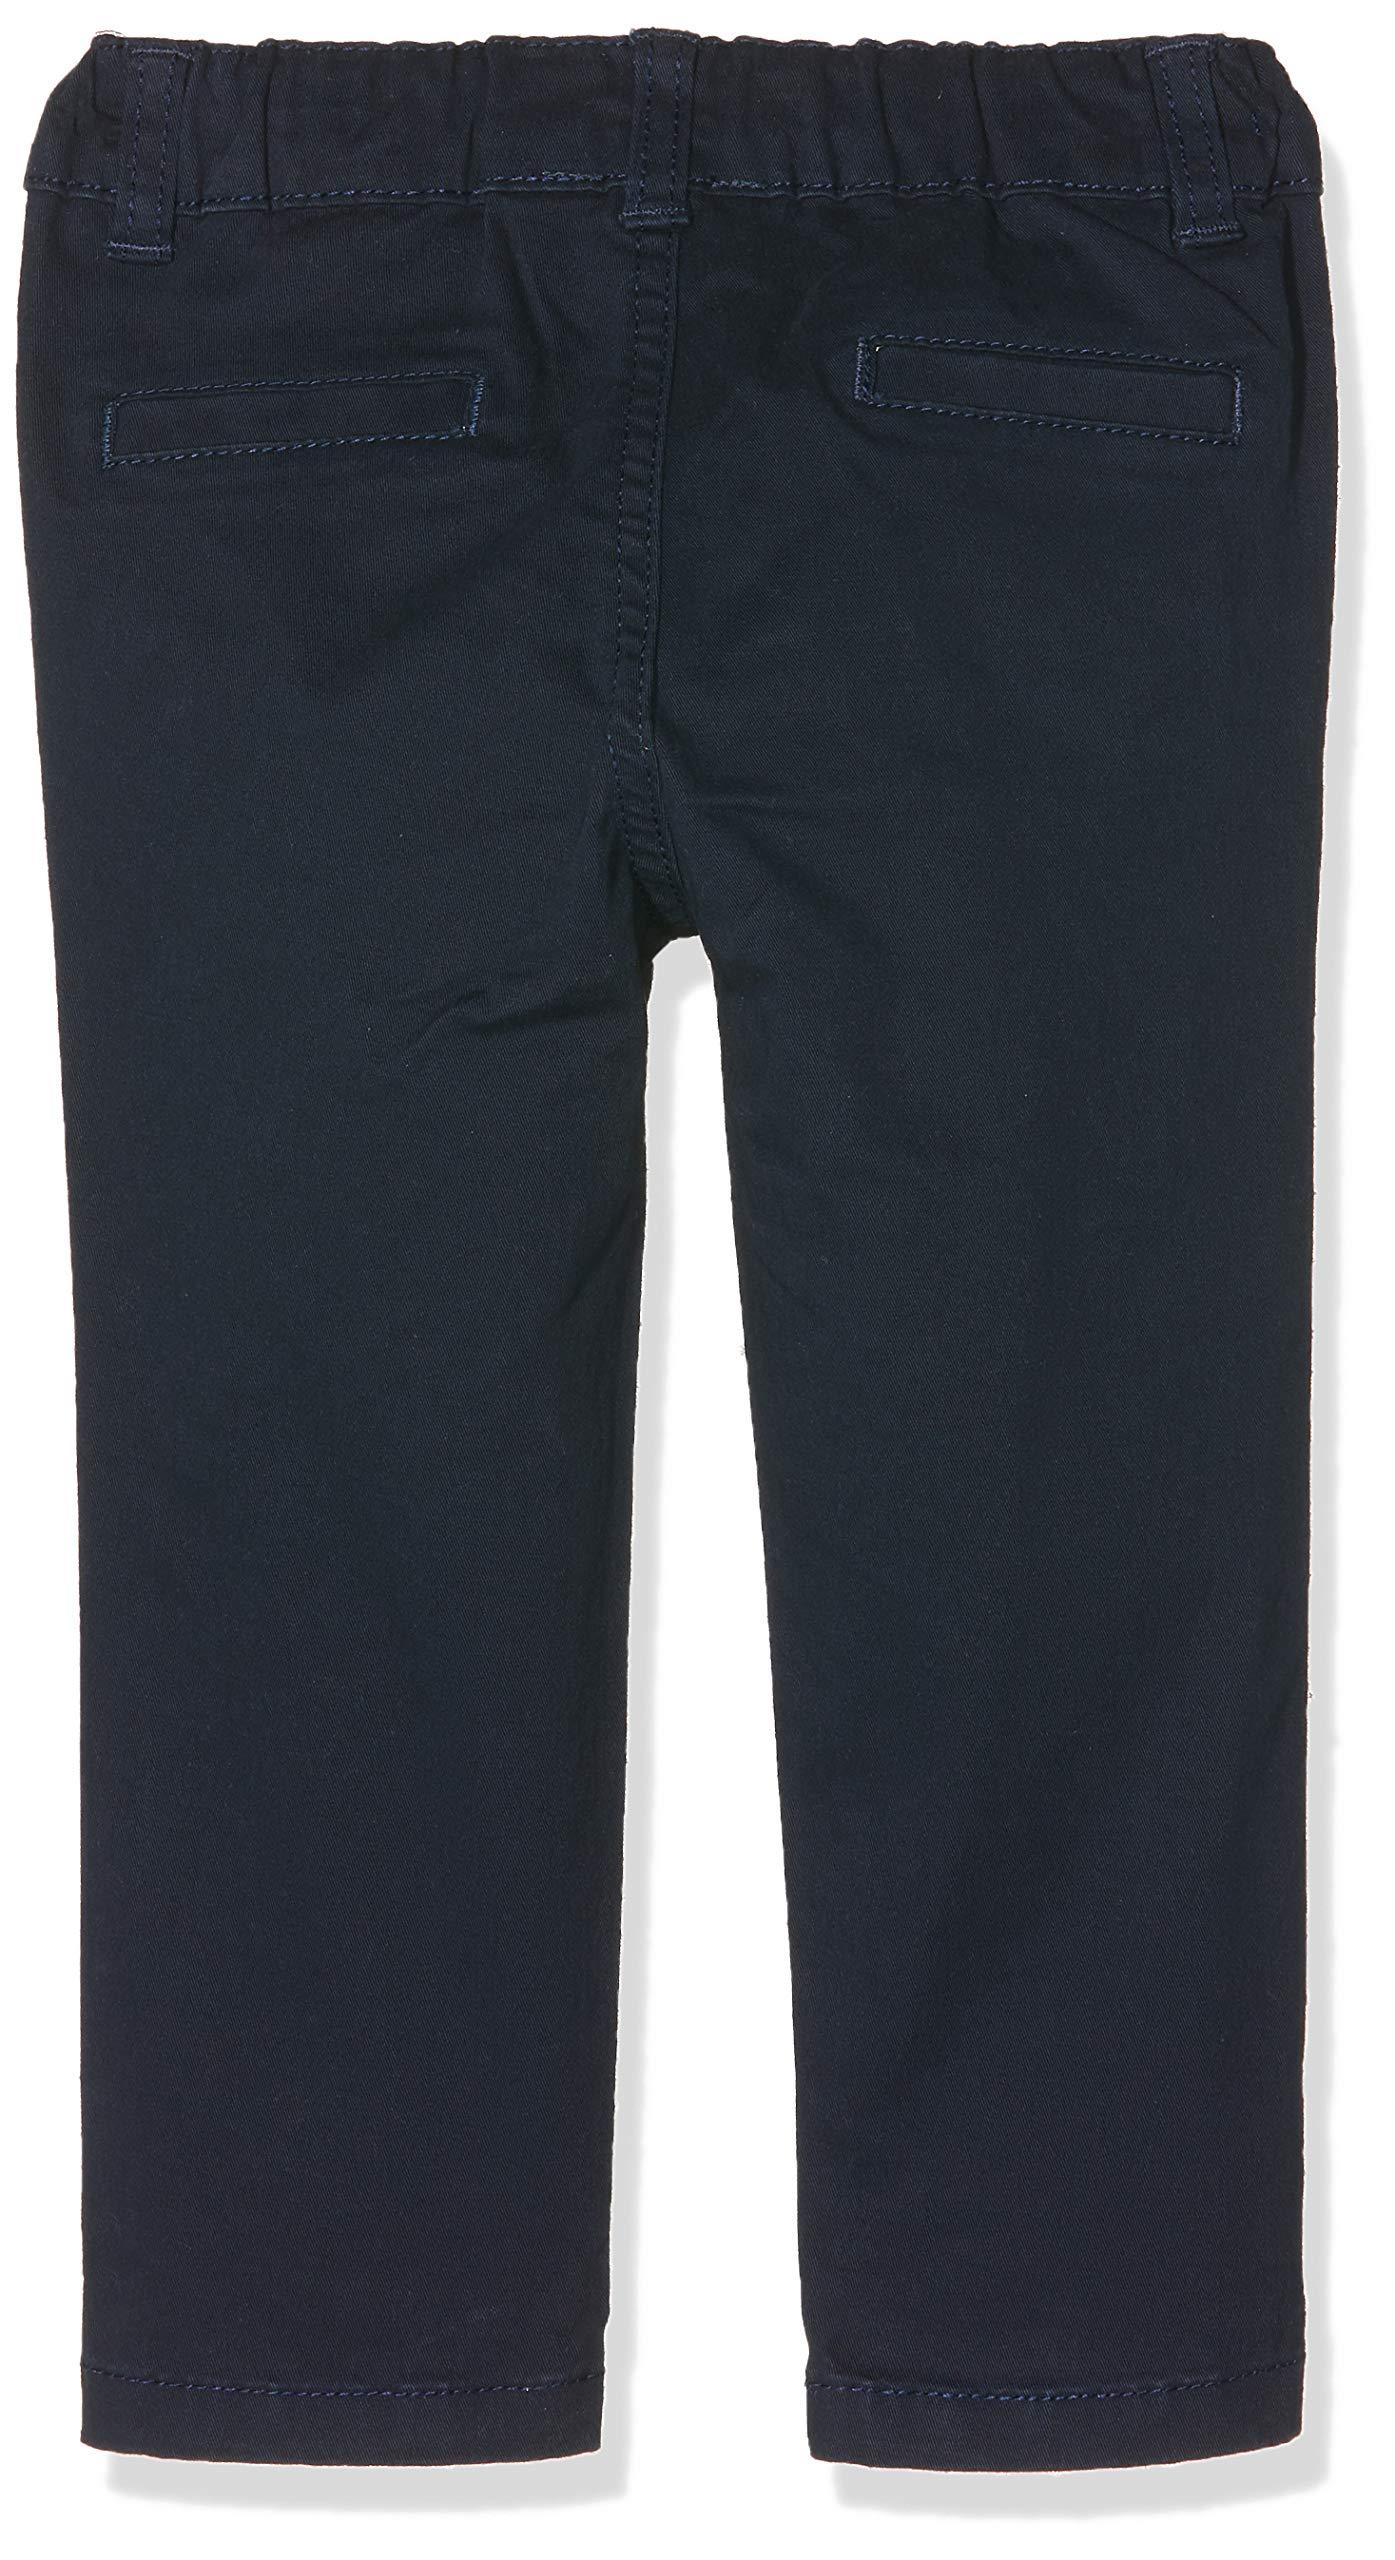 Chicco Pantaloni Lunghi Pantalones para Bebés 4